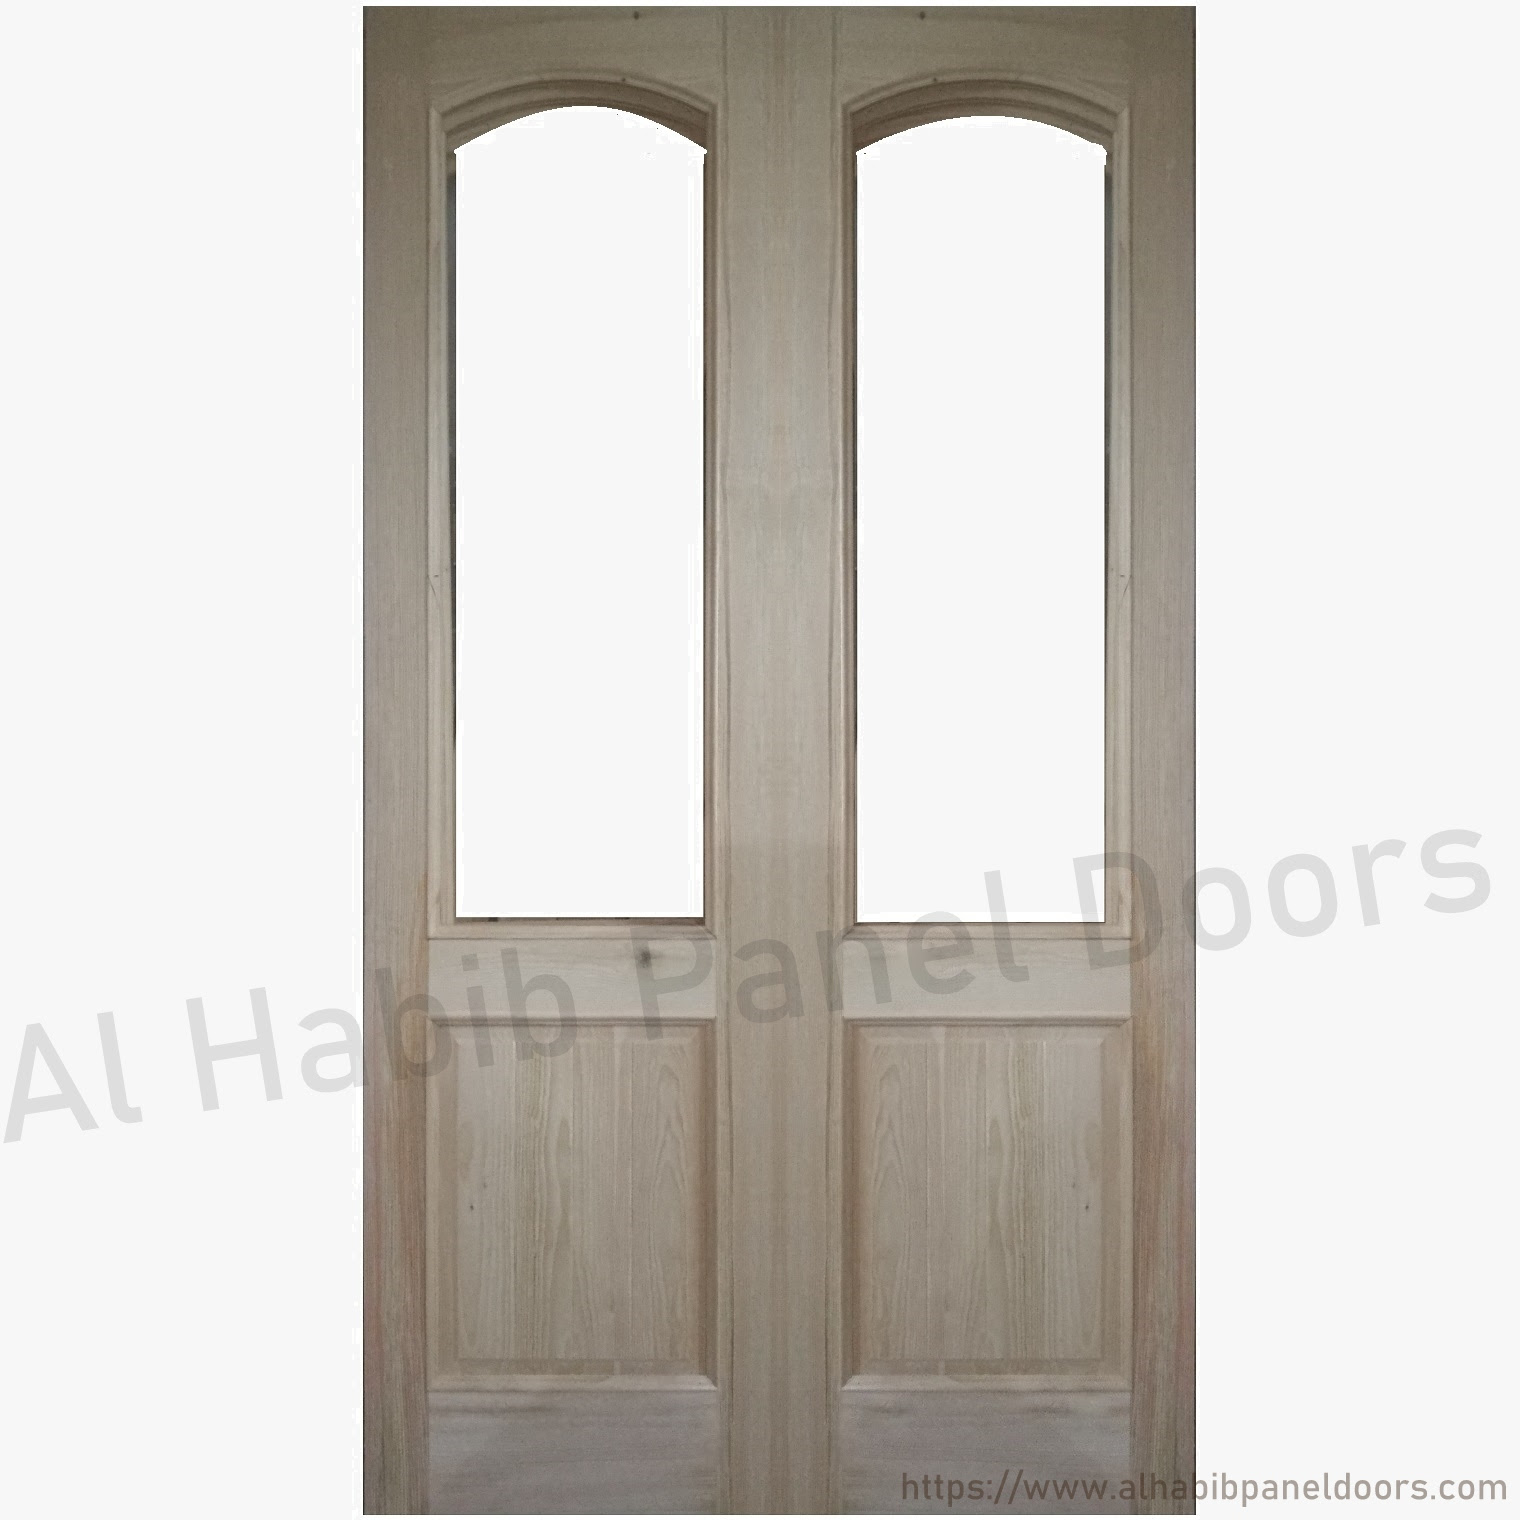 door design with glass and wood  | 583 x 745